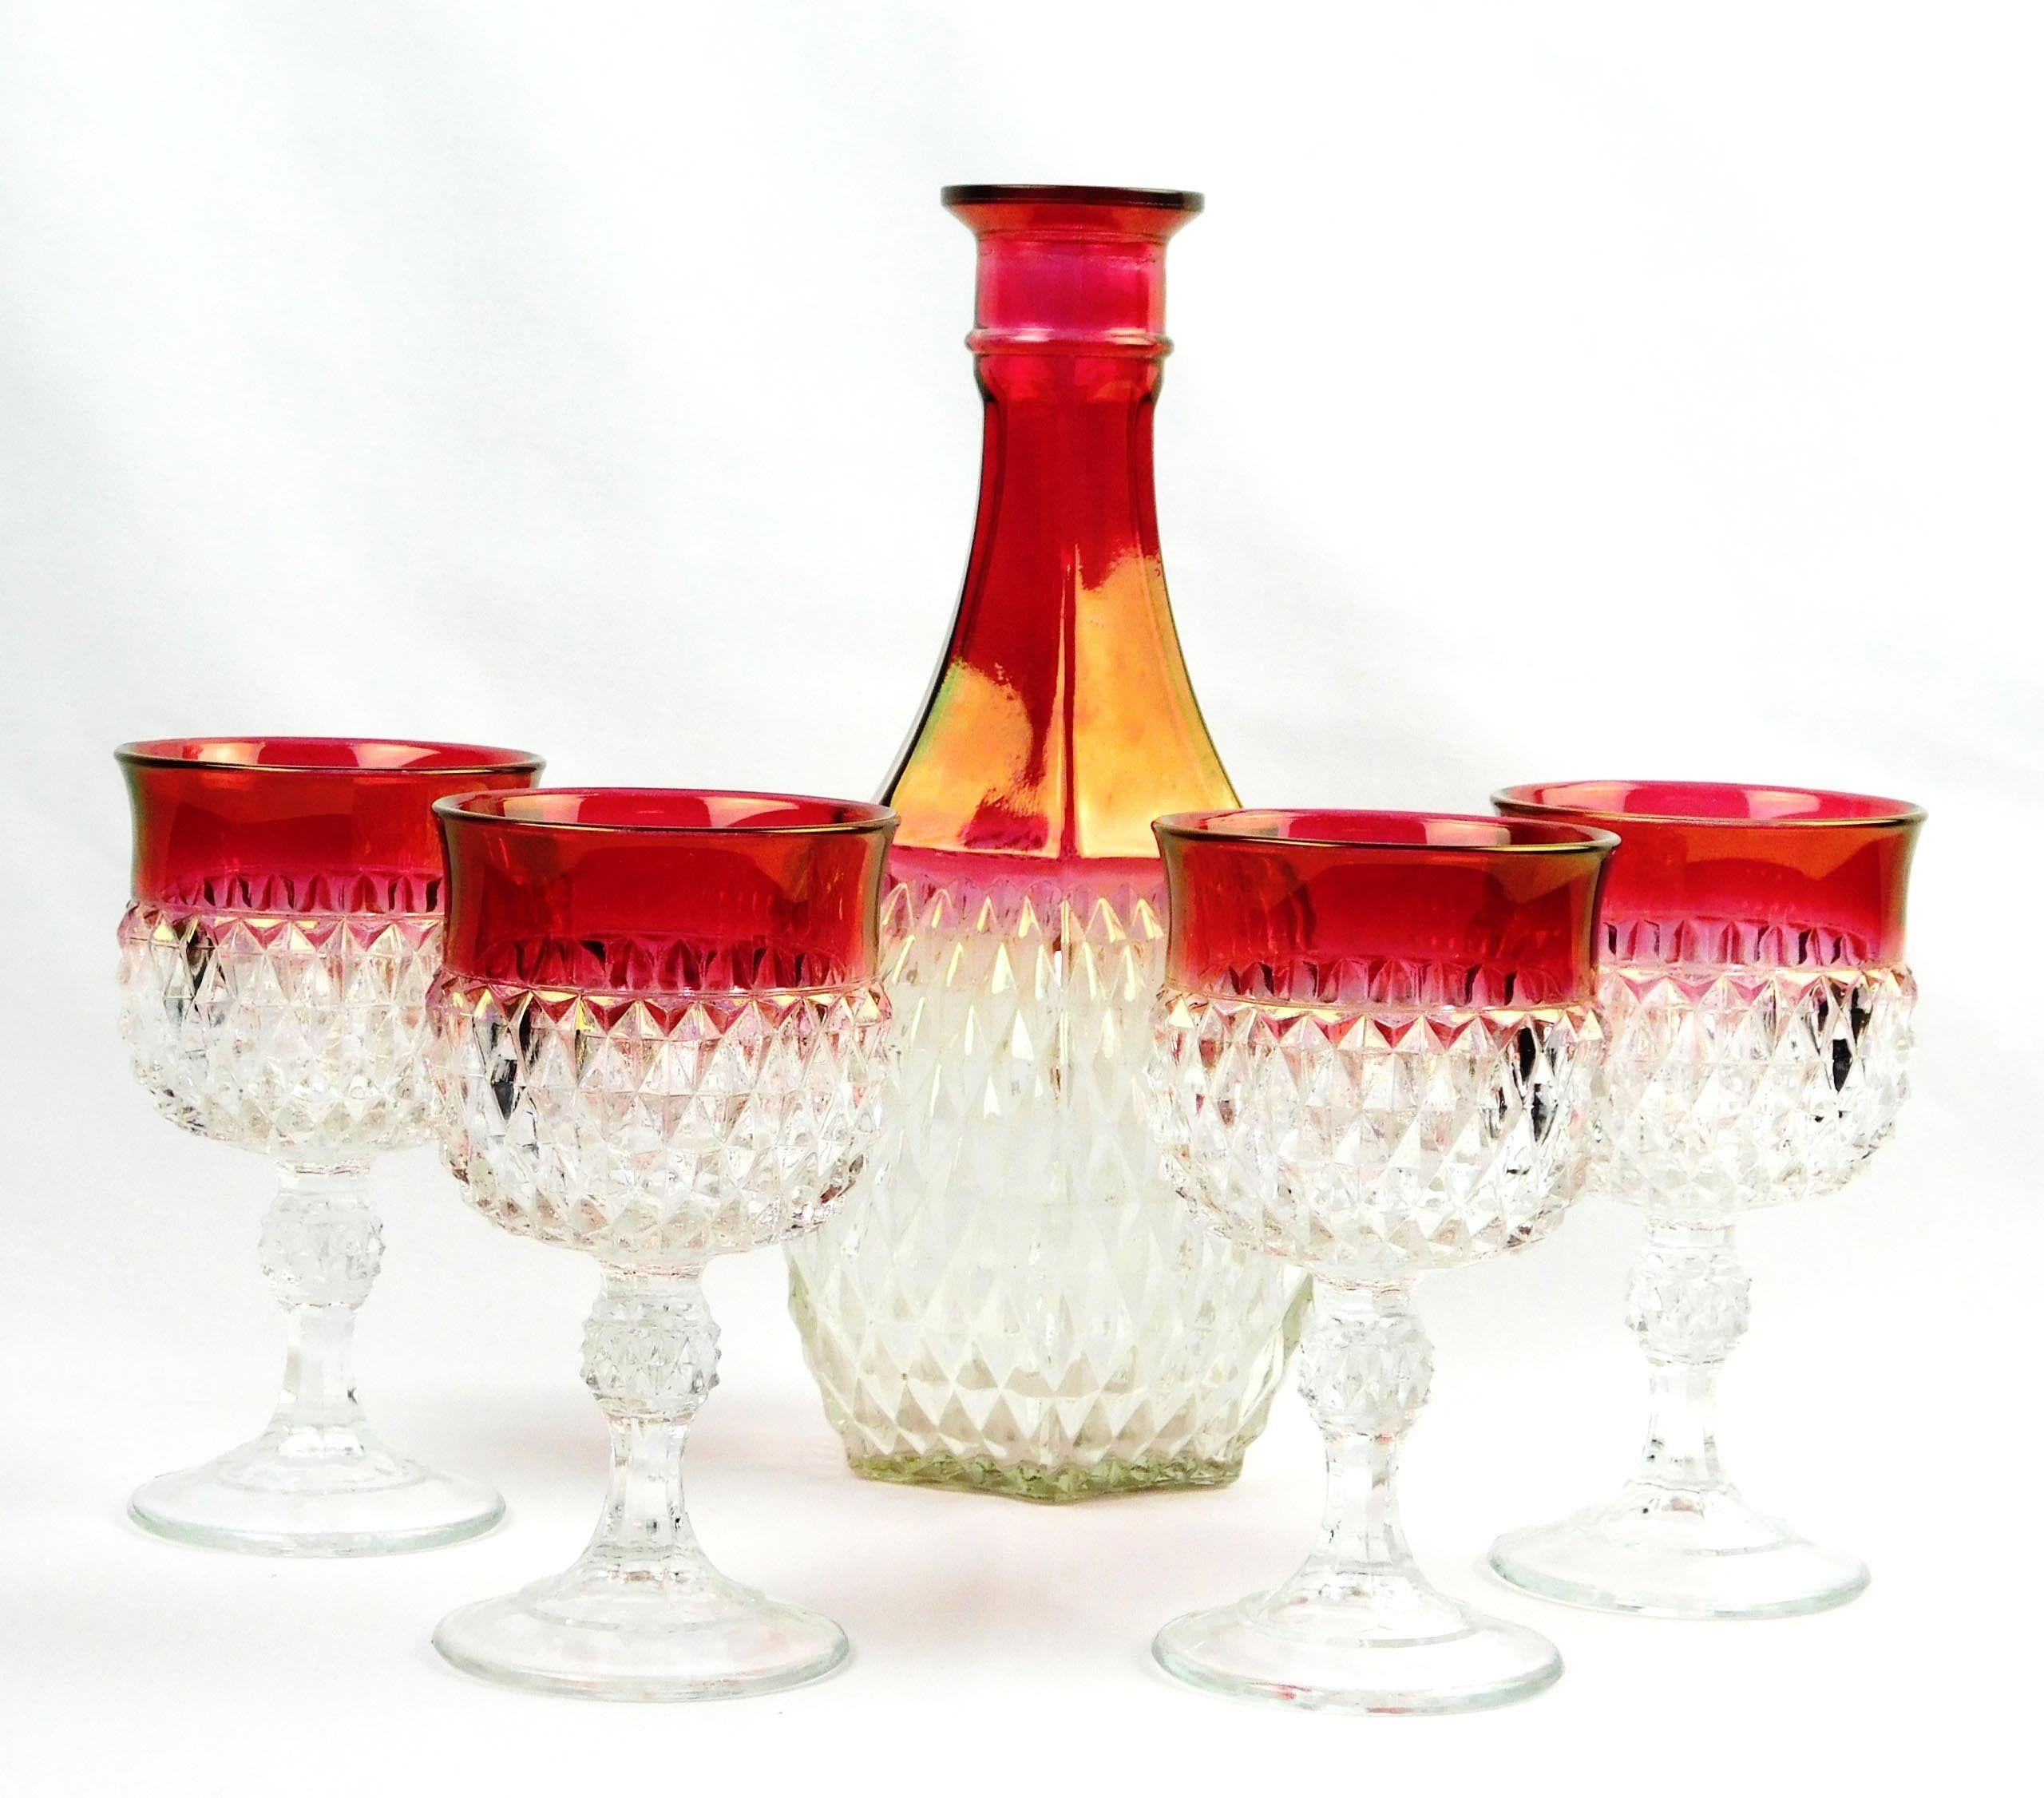 Indiana Glass Diamond Point Ruby Red Wine Decanter 4 Stem Wine Etsy In 2020 Red Wine Decanter Indiana Glass Wine Glasses